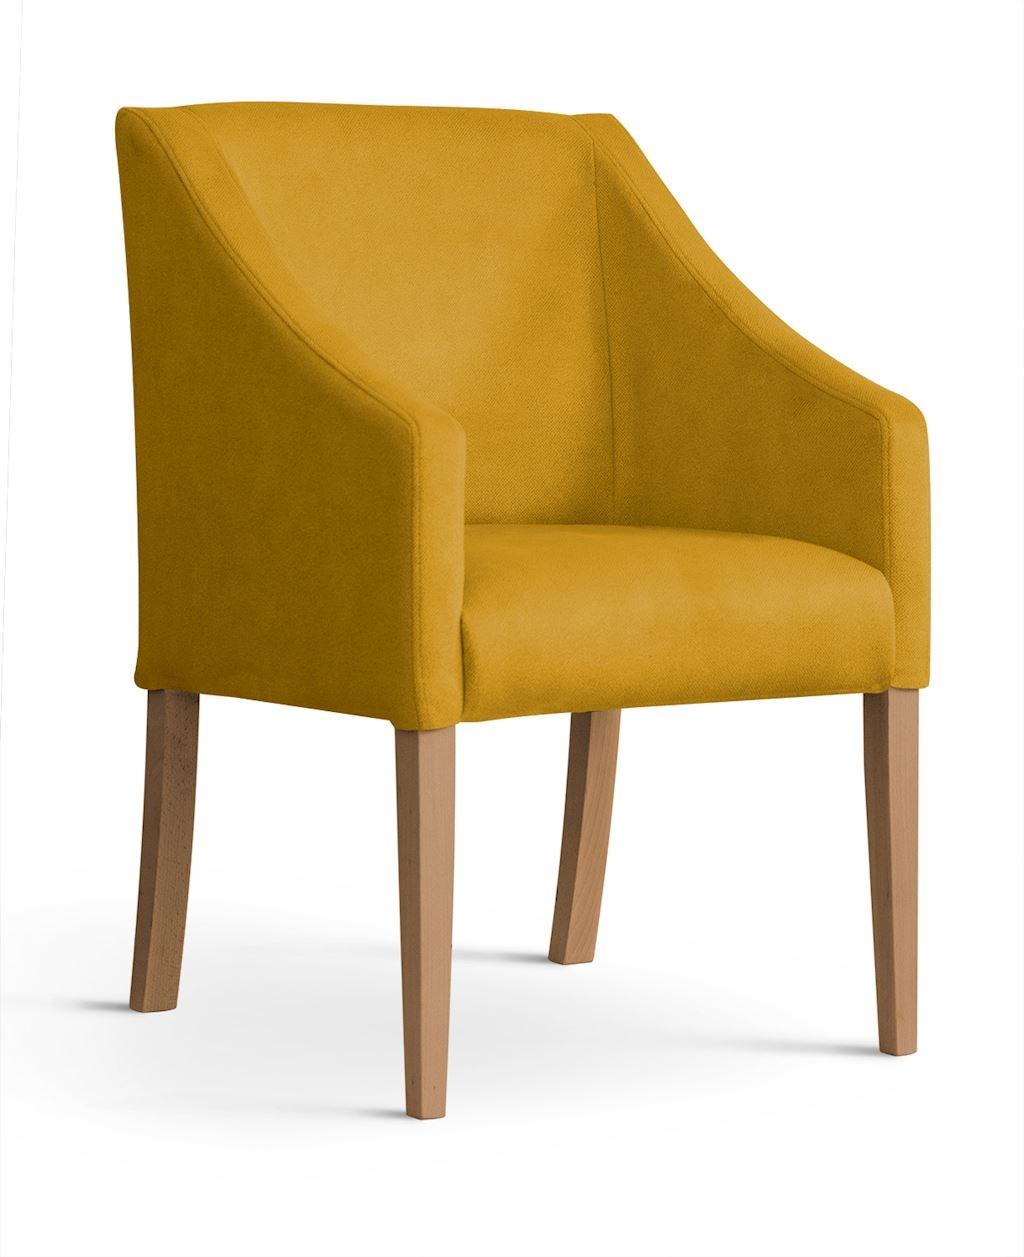 Fotoliu fix tapitat cu stofa, cu picioare din lemn Capri Honey / Oak, l58xA60xH89 cm imagine